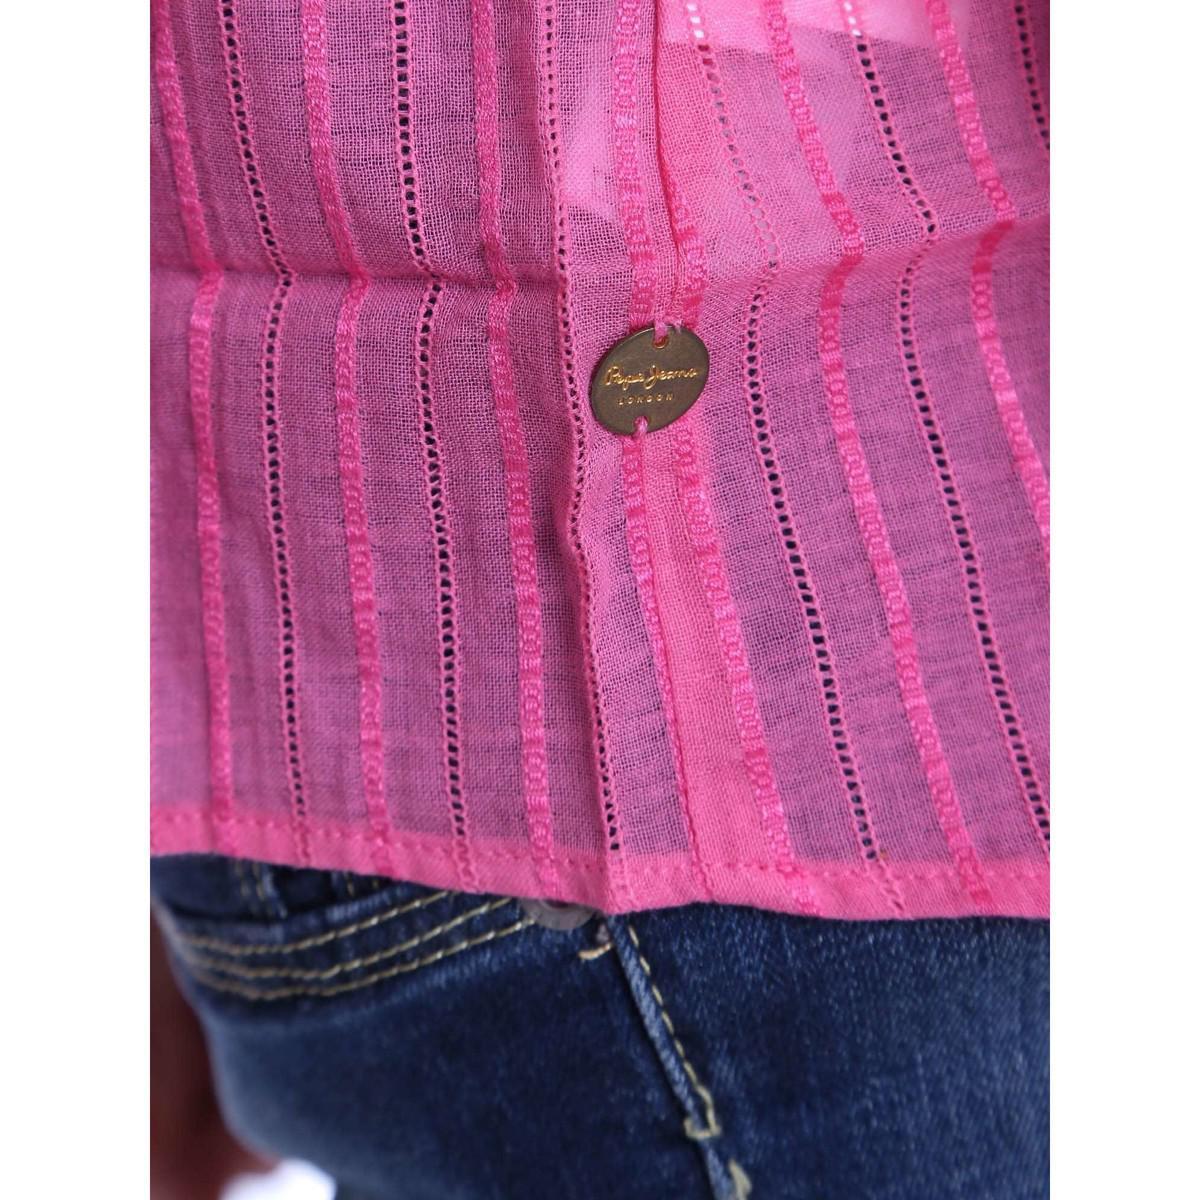 Pepe Jeans Denim Pl302051 Blusa Women Pink Women's Blouse In Pink